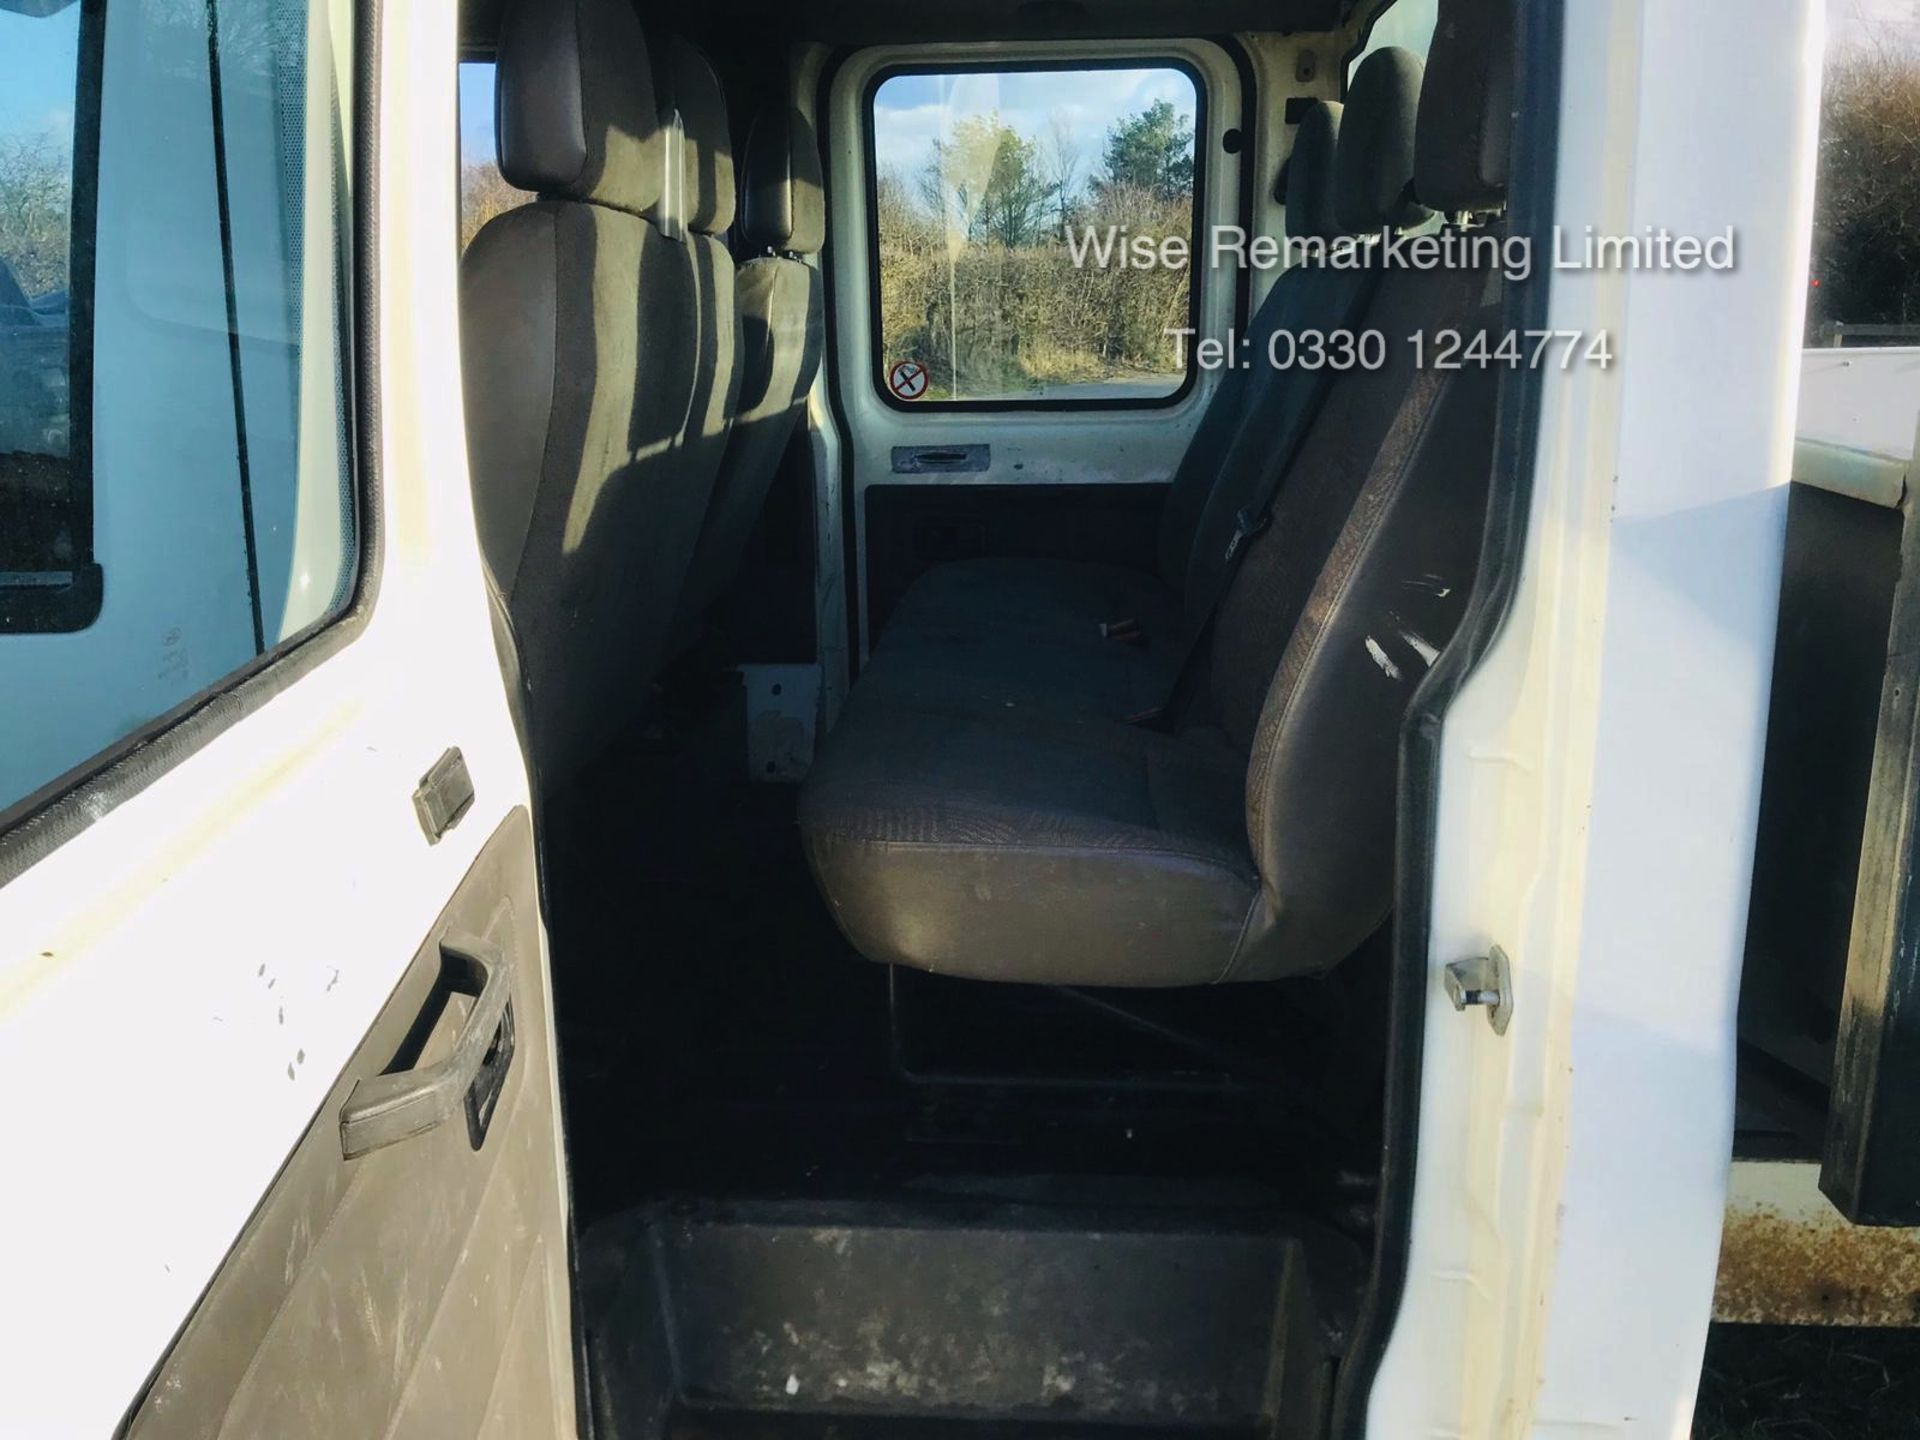 Lot 27 - Ford Transit 350 Crew Cab Tipper LWB - 2005 05 Reg - 6 Seater - SAVE 20% NO VAT